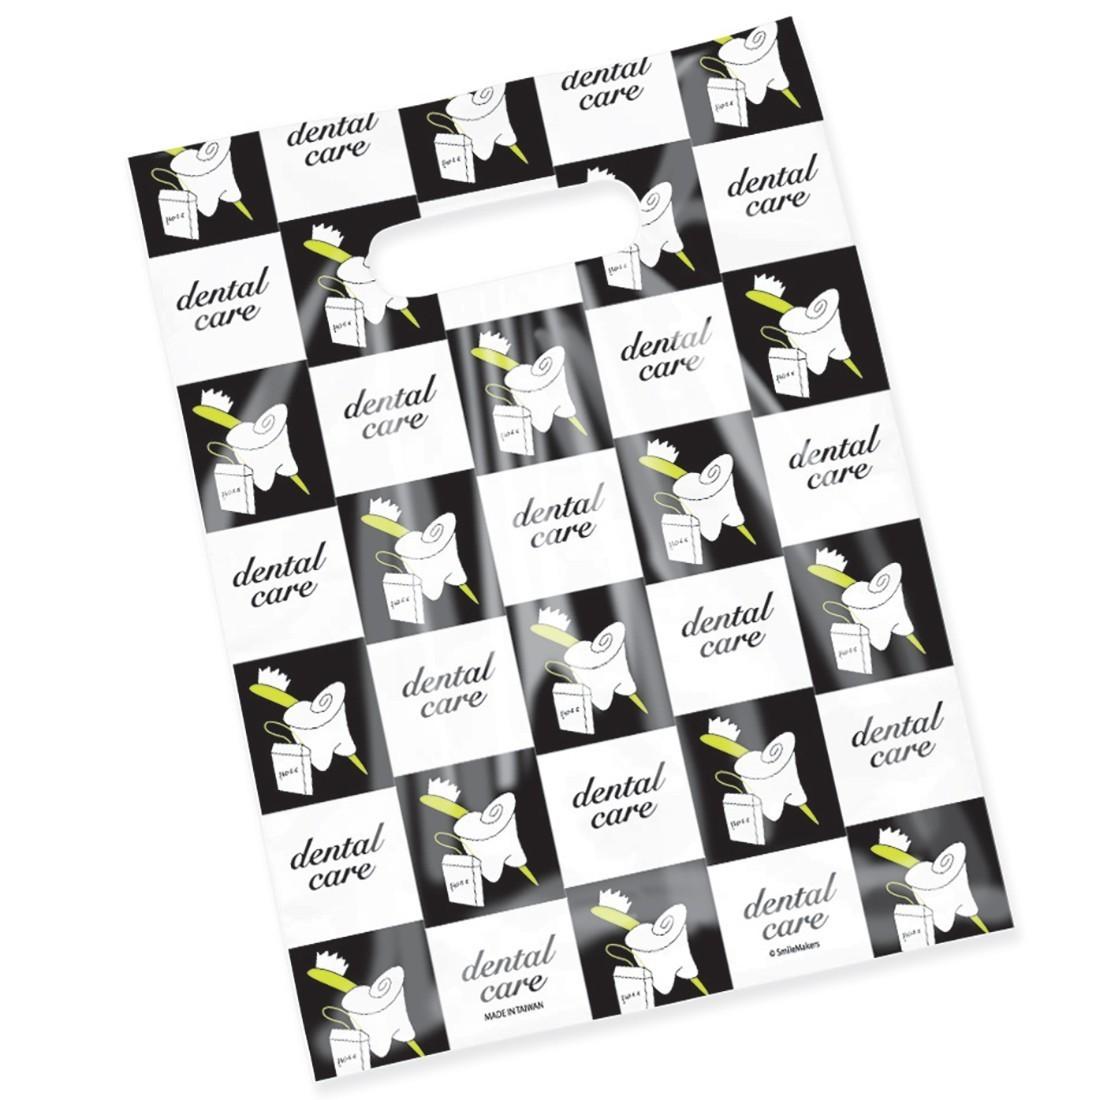 Scatter Print Dental Care Bags [image]